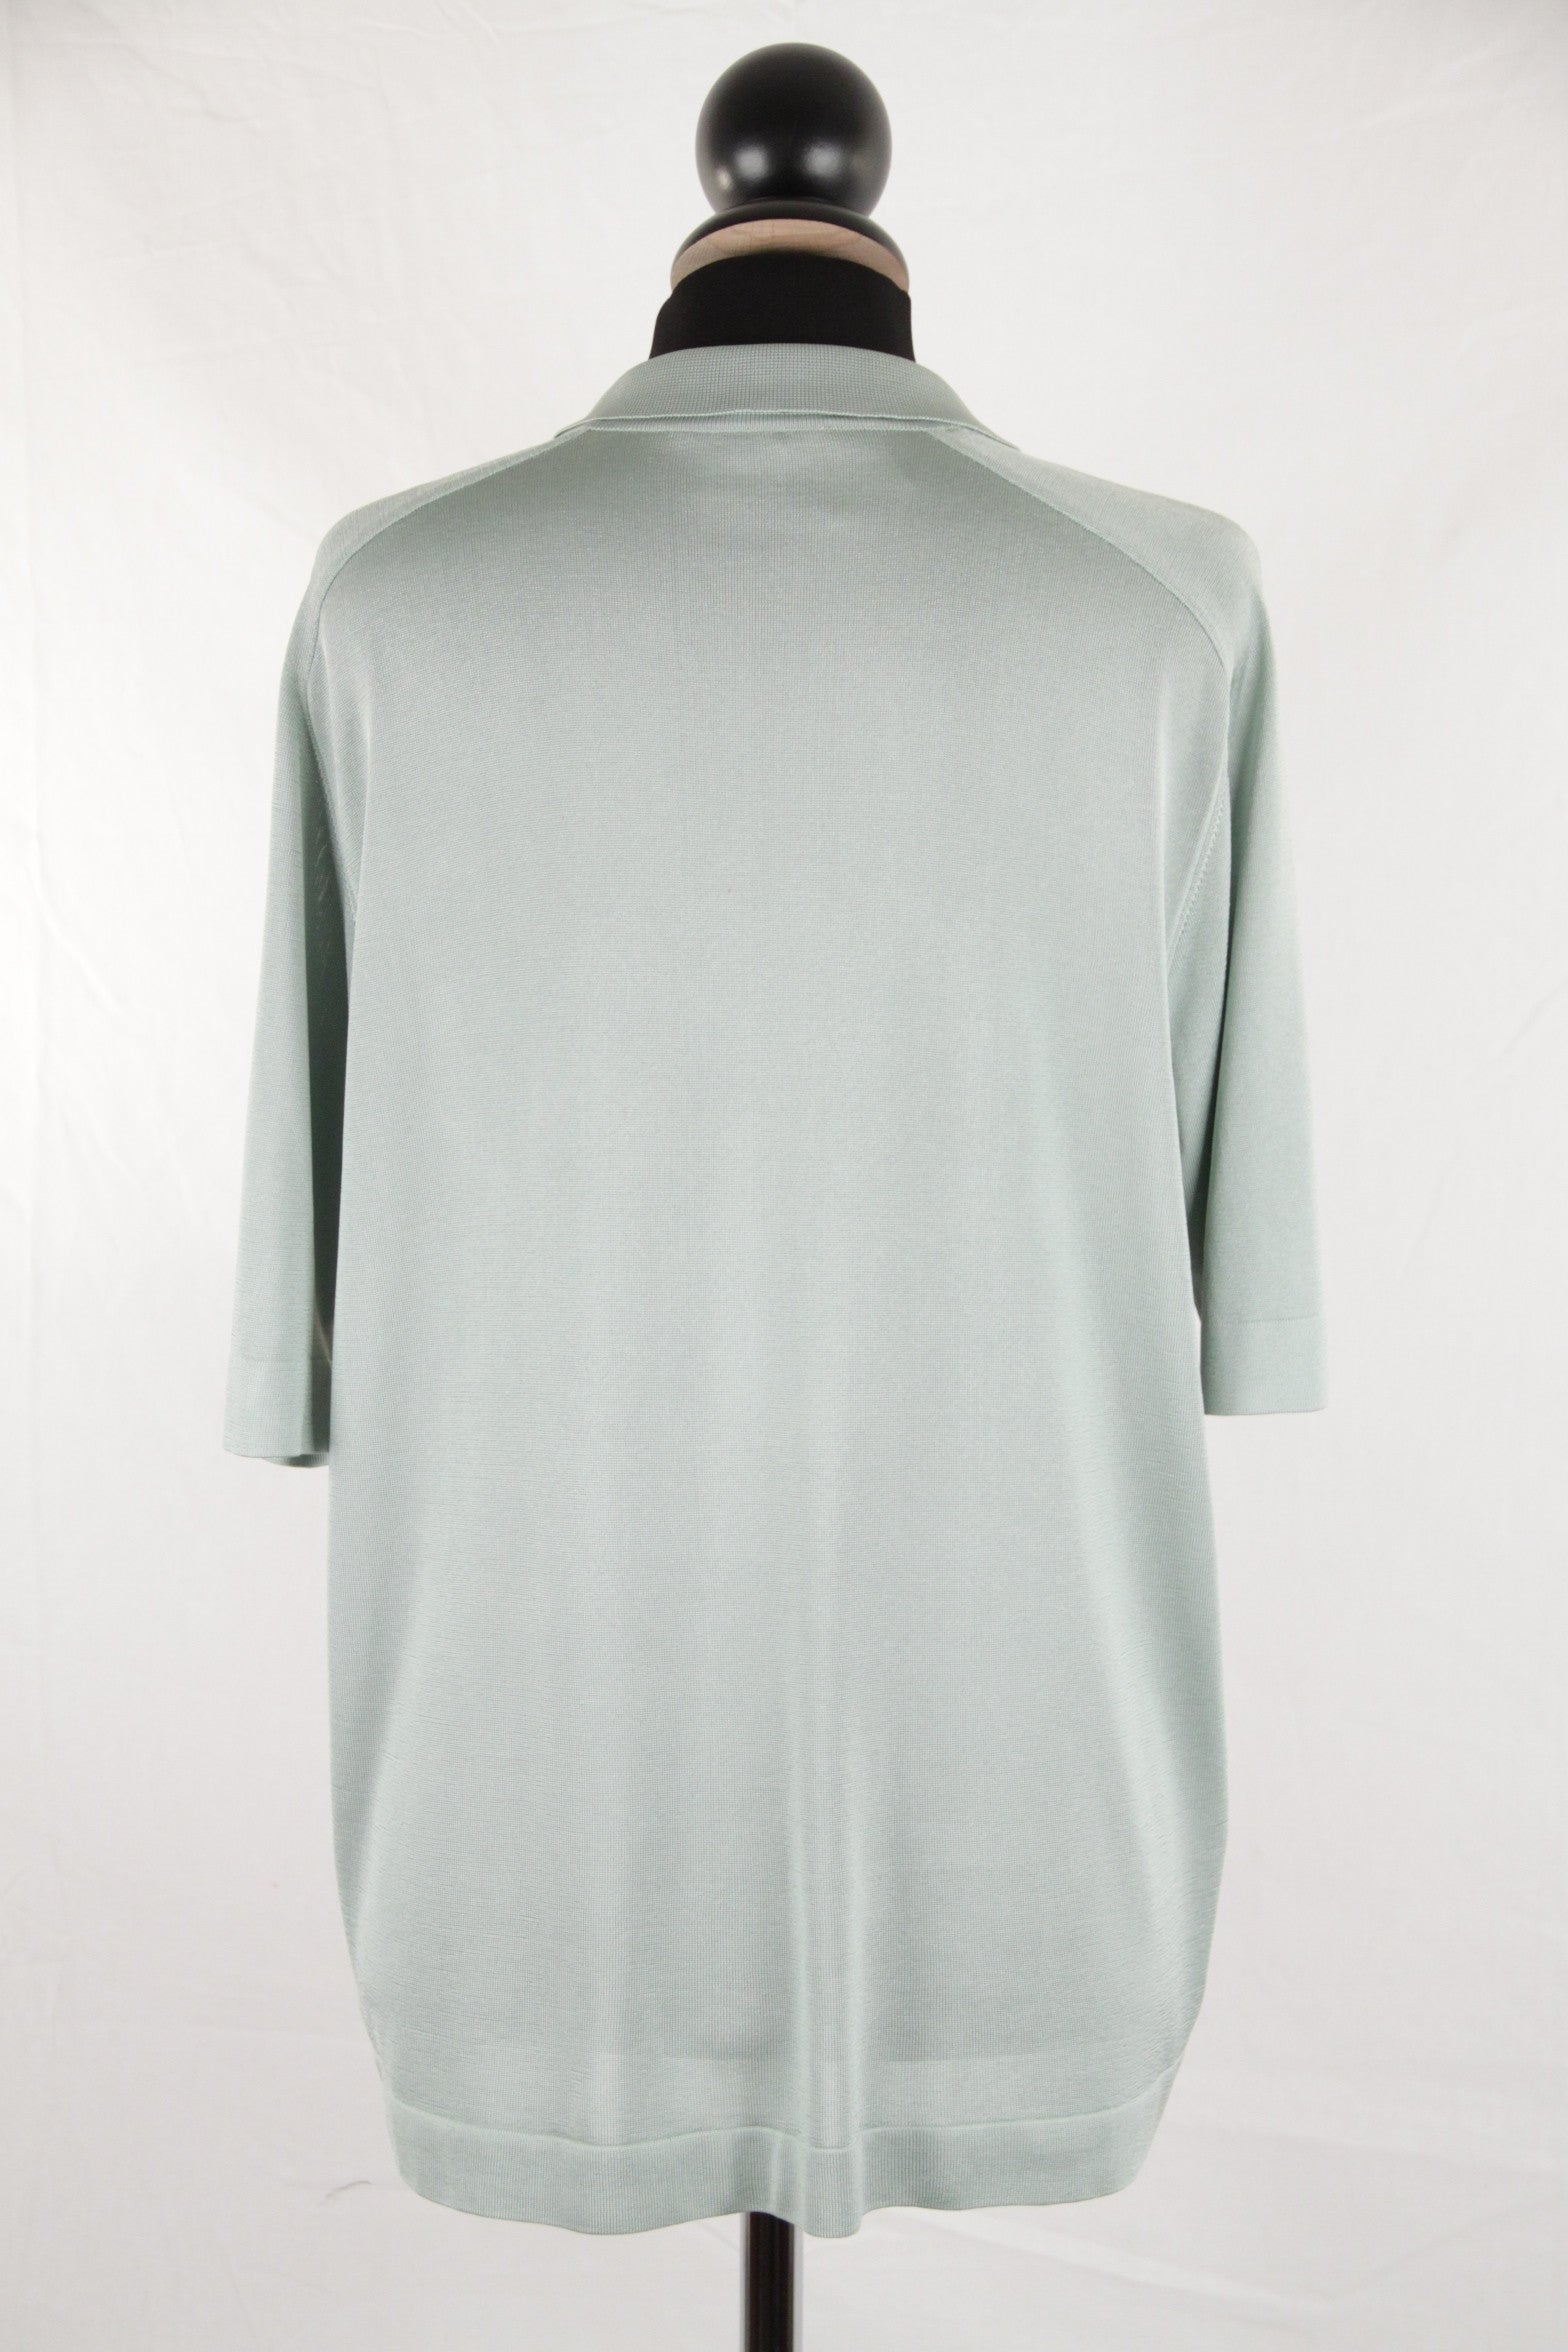 Hermes Vintage Aqua Silk Polo Shirt W Silk Scarf Panel Size 40 For